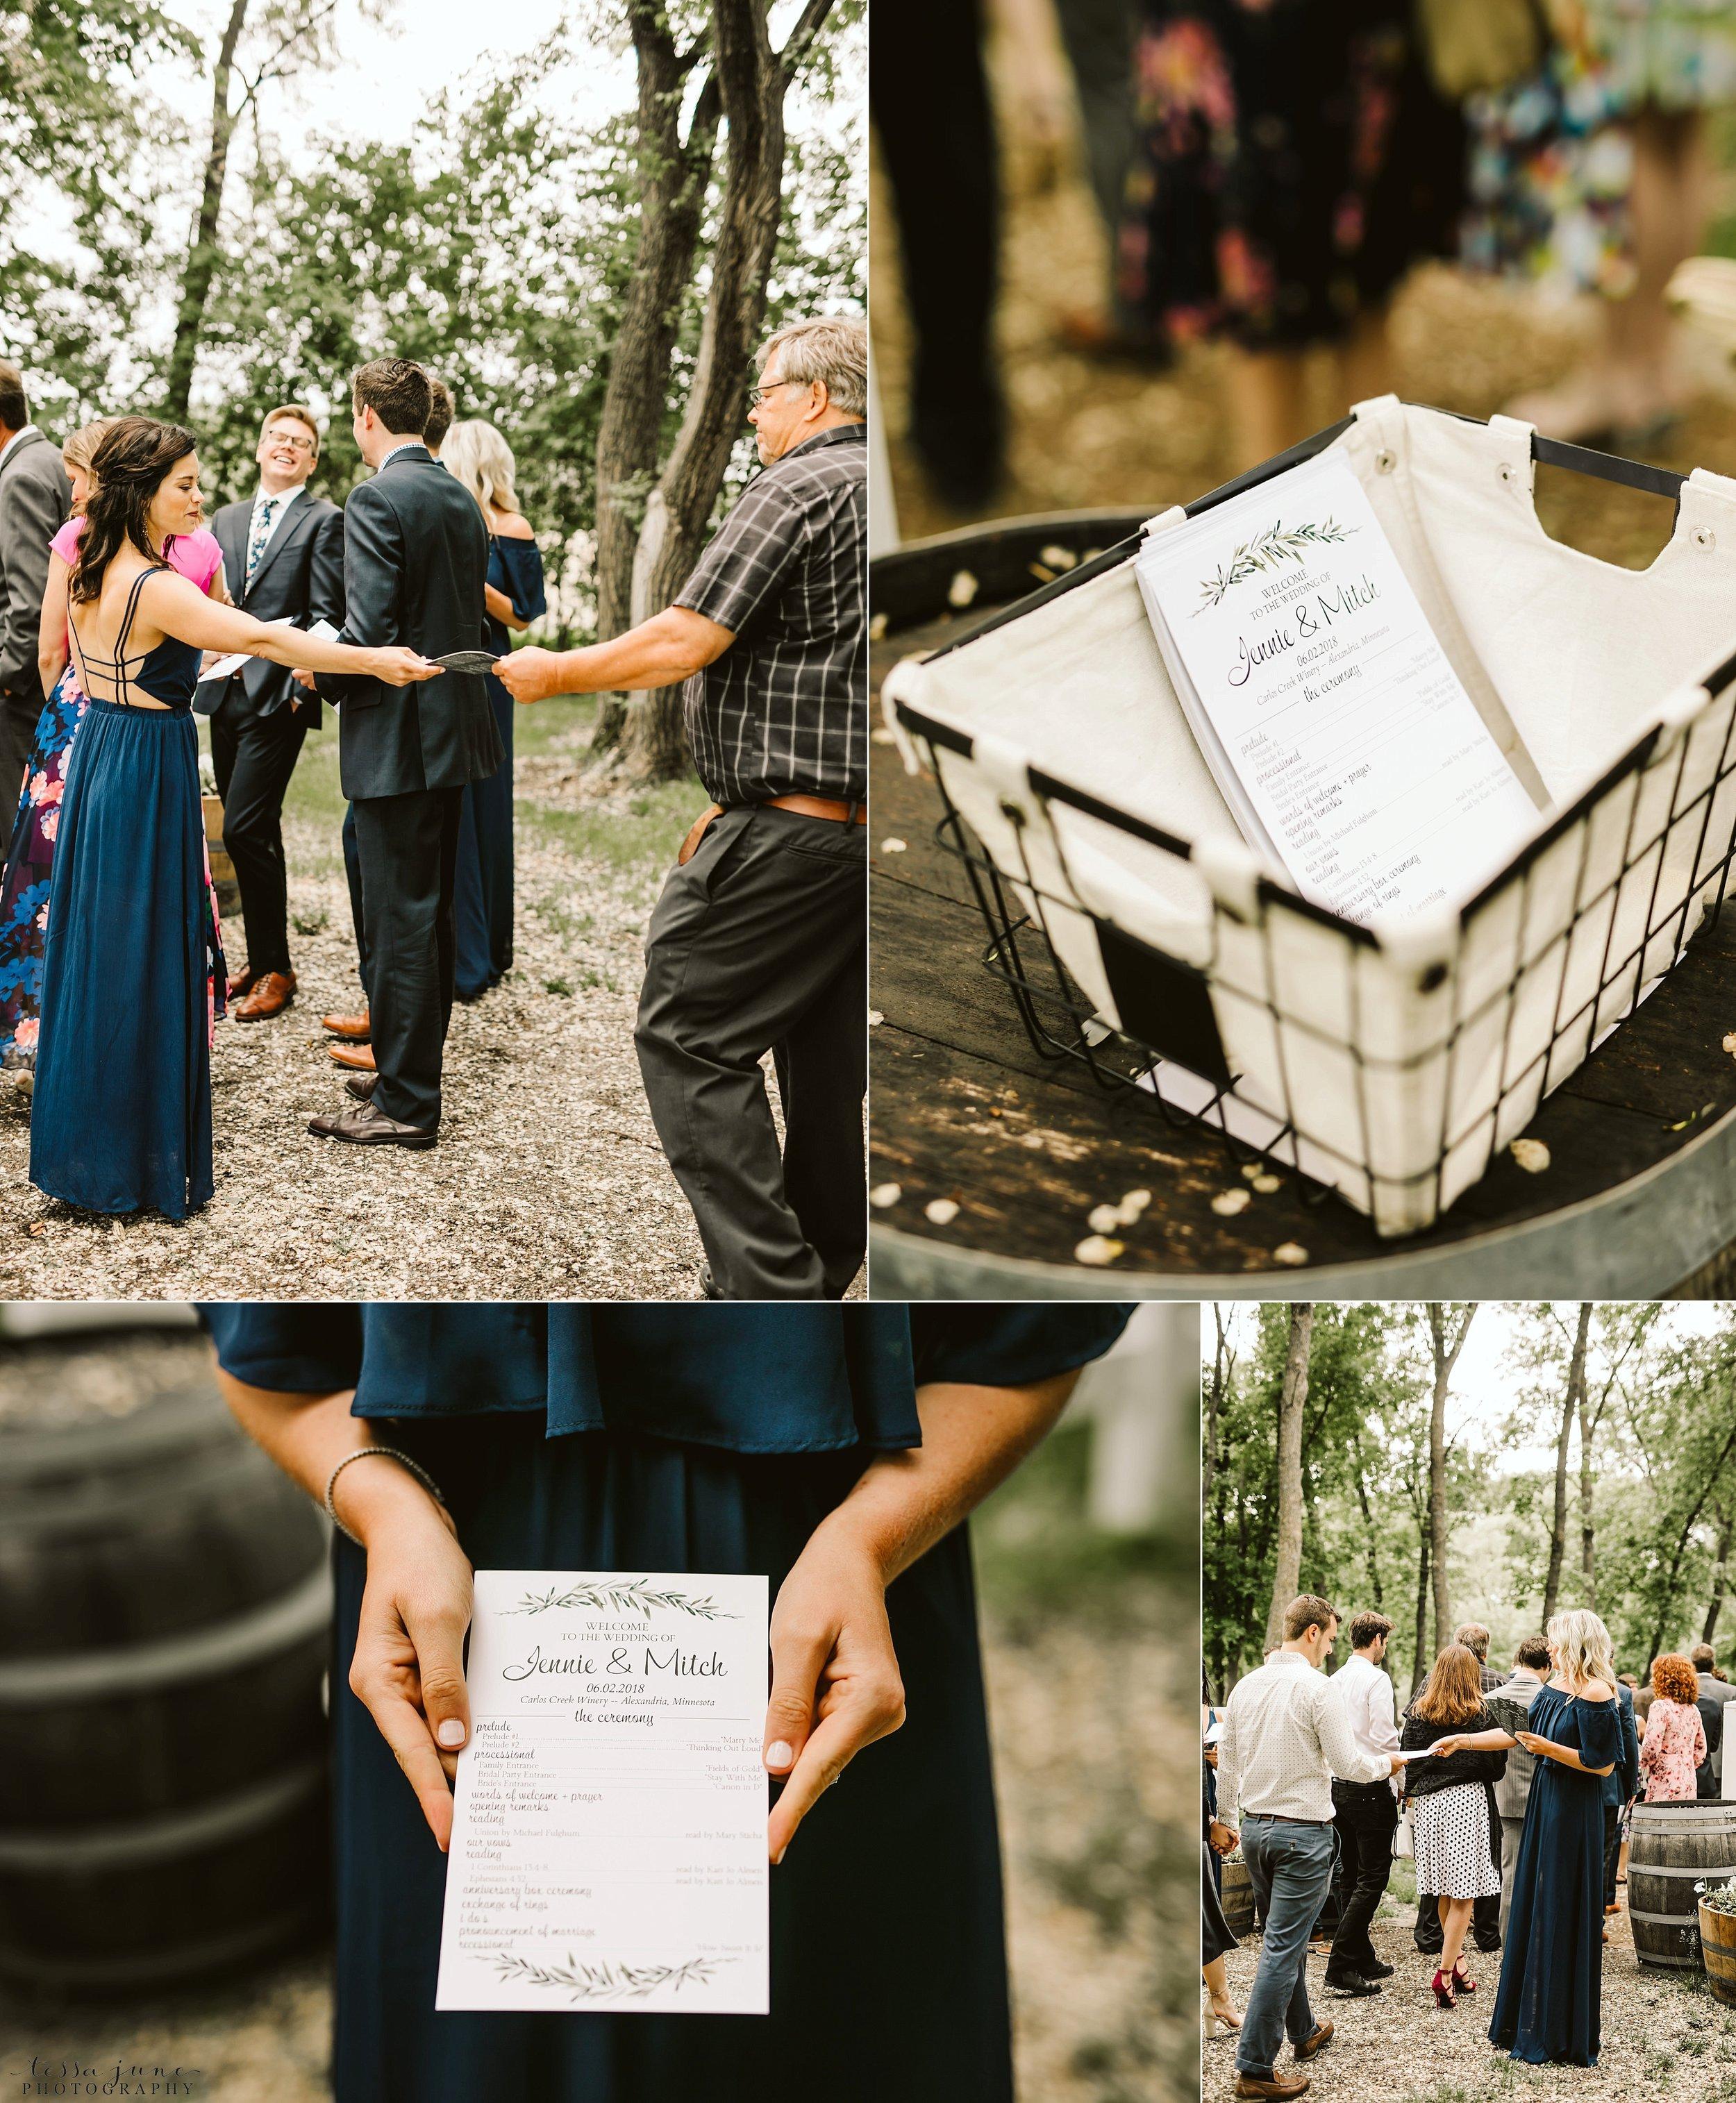 carlos-creek-winery-wedding-summer-pristine-floral-blush-pink-navy-alexandria-minnesota-92.jpg